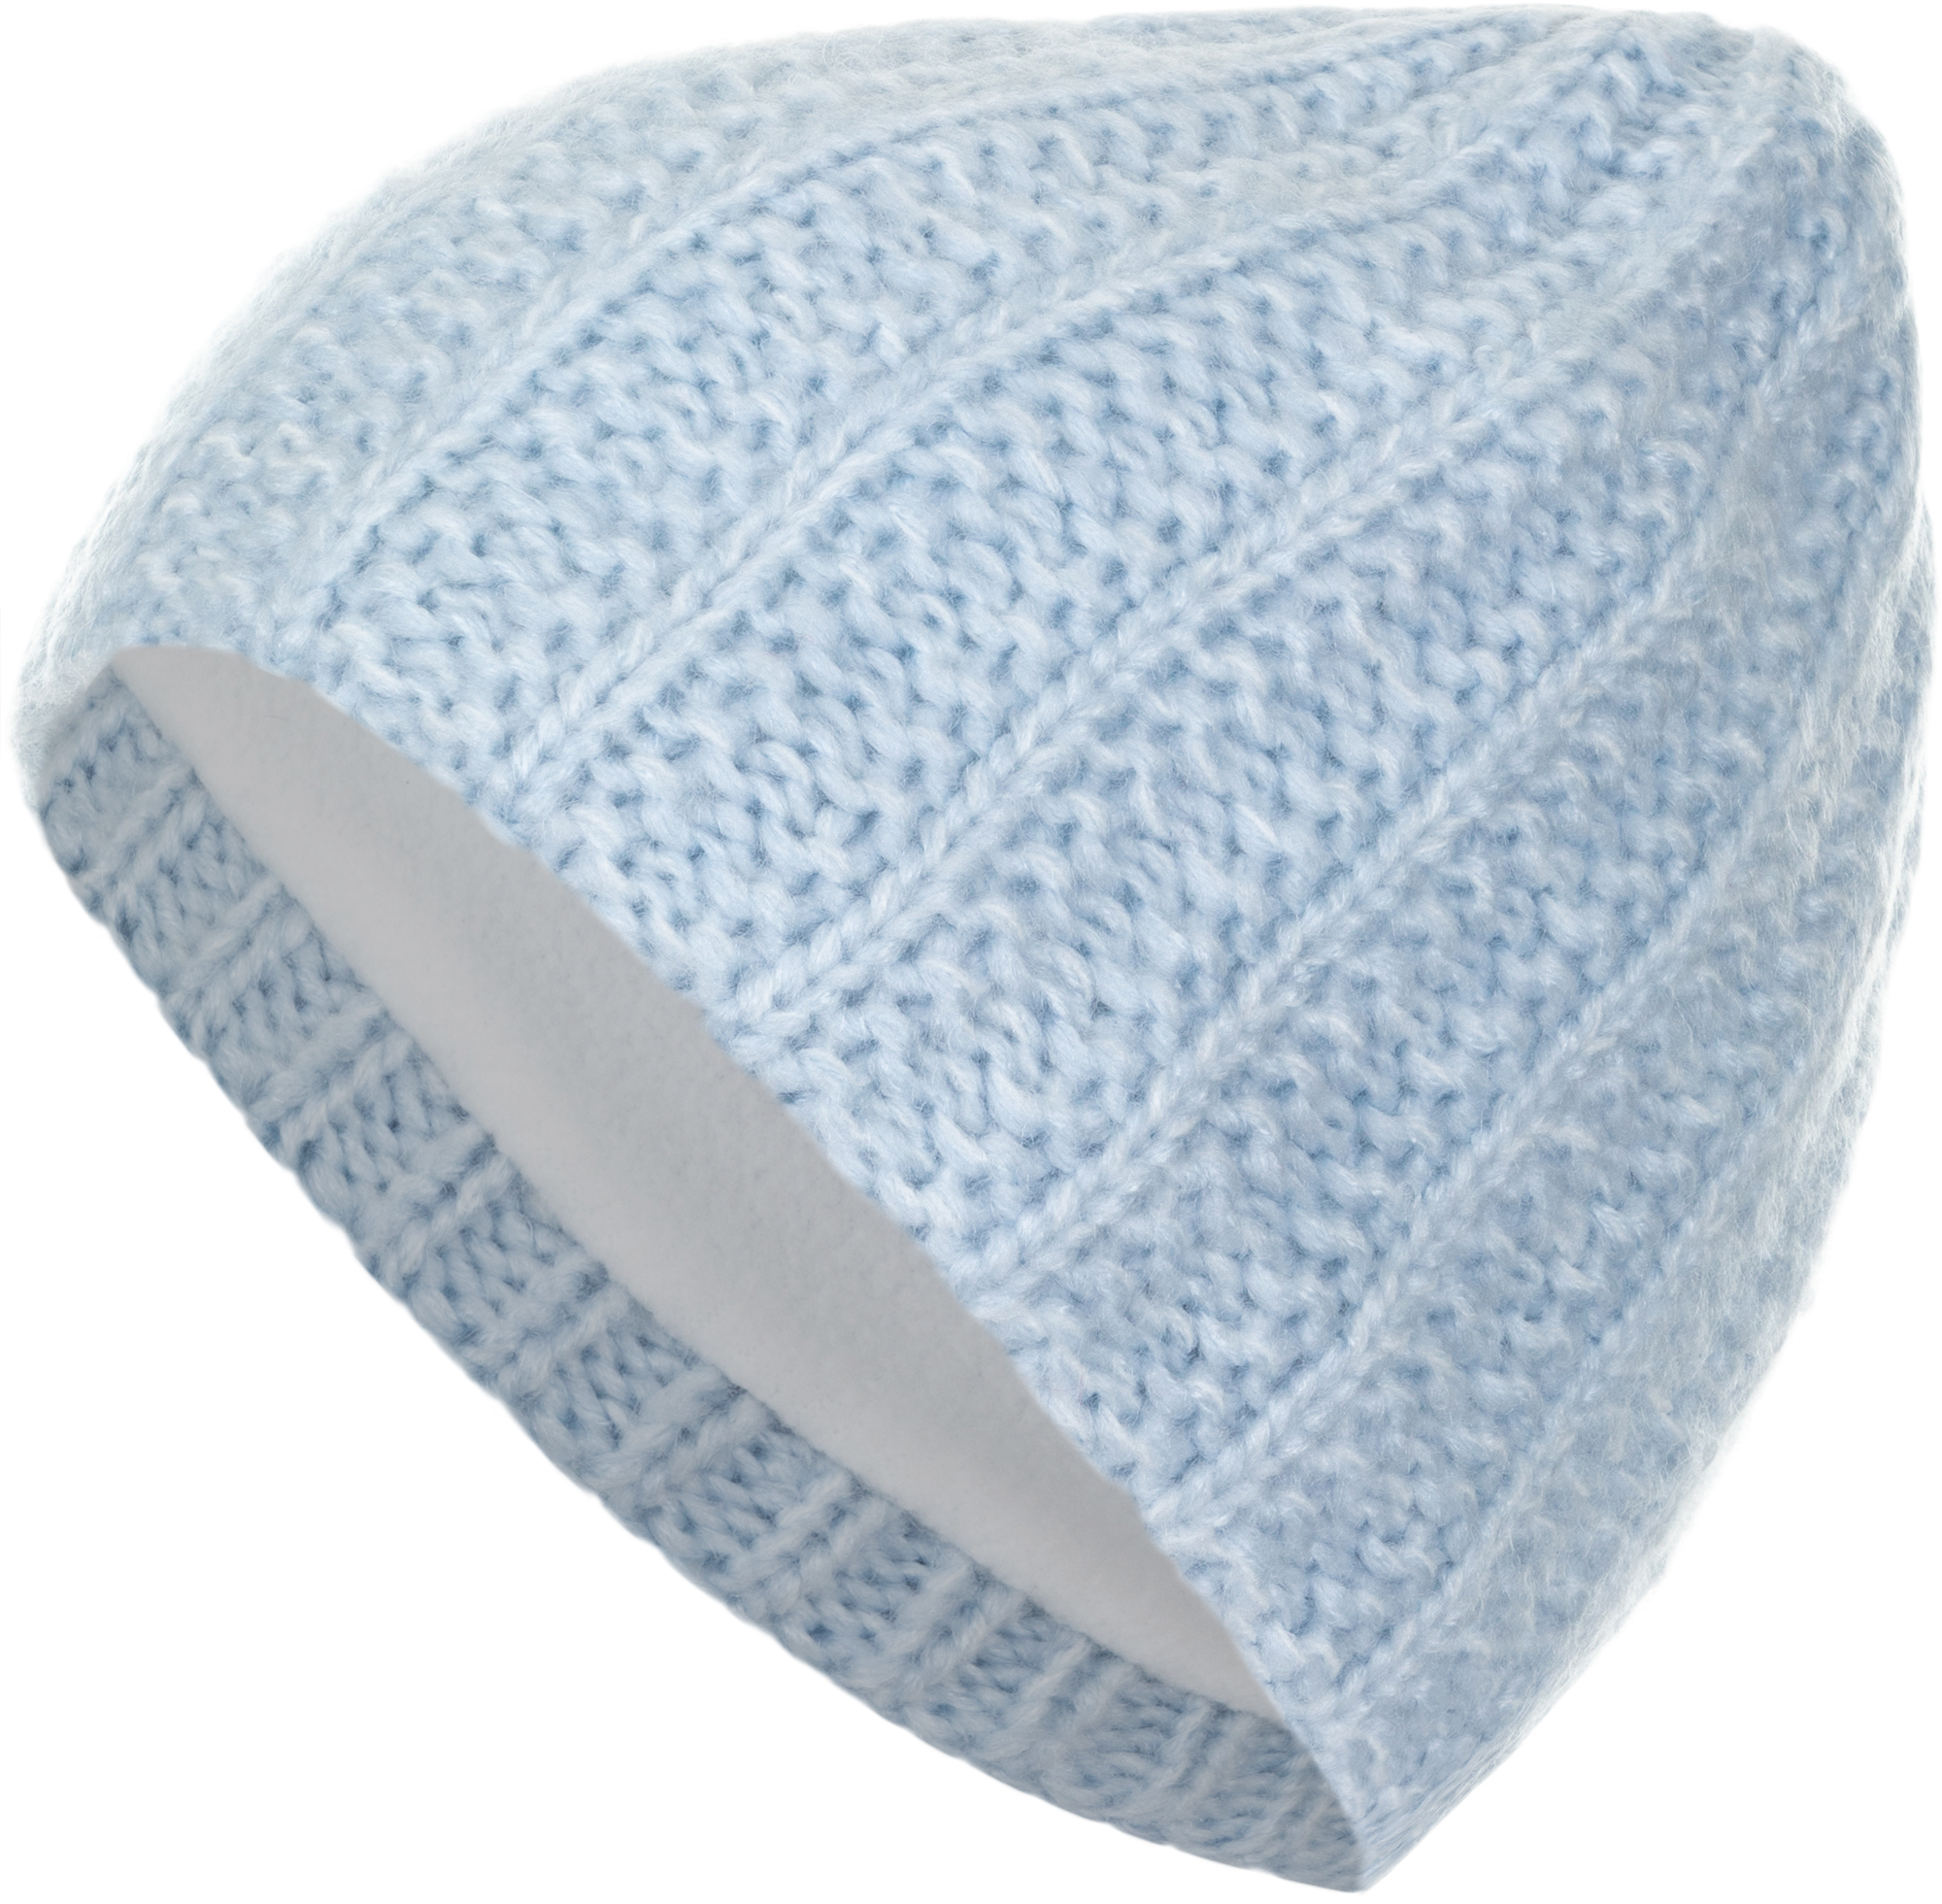 IcePeak Шапка женская IcePeak Ivica, размер Без размера icepeak шапка для девочек icepeak lito размер без размера